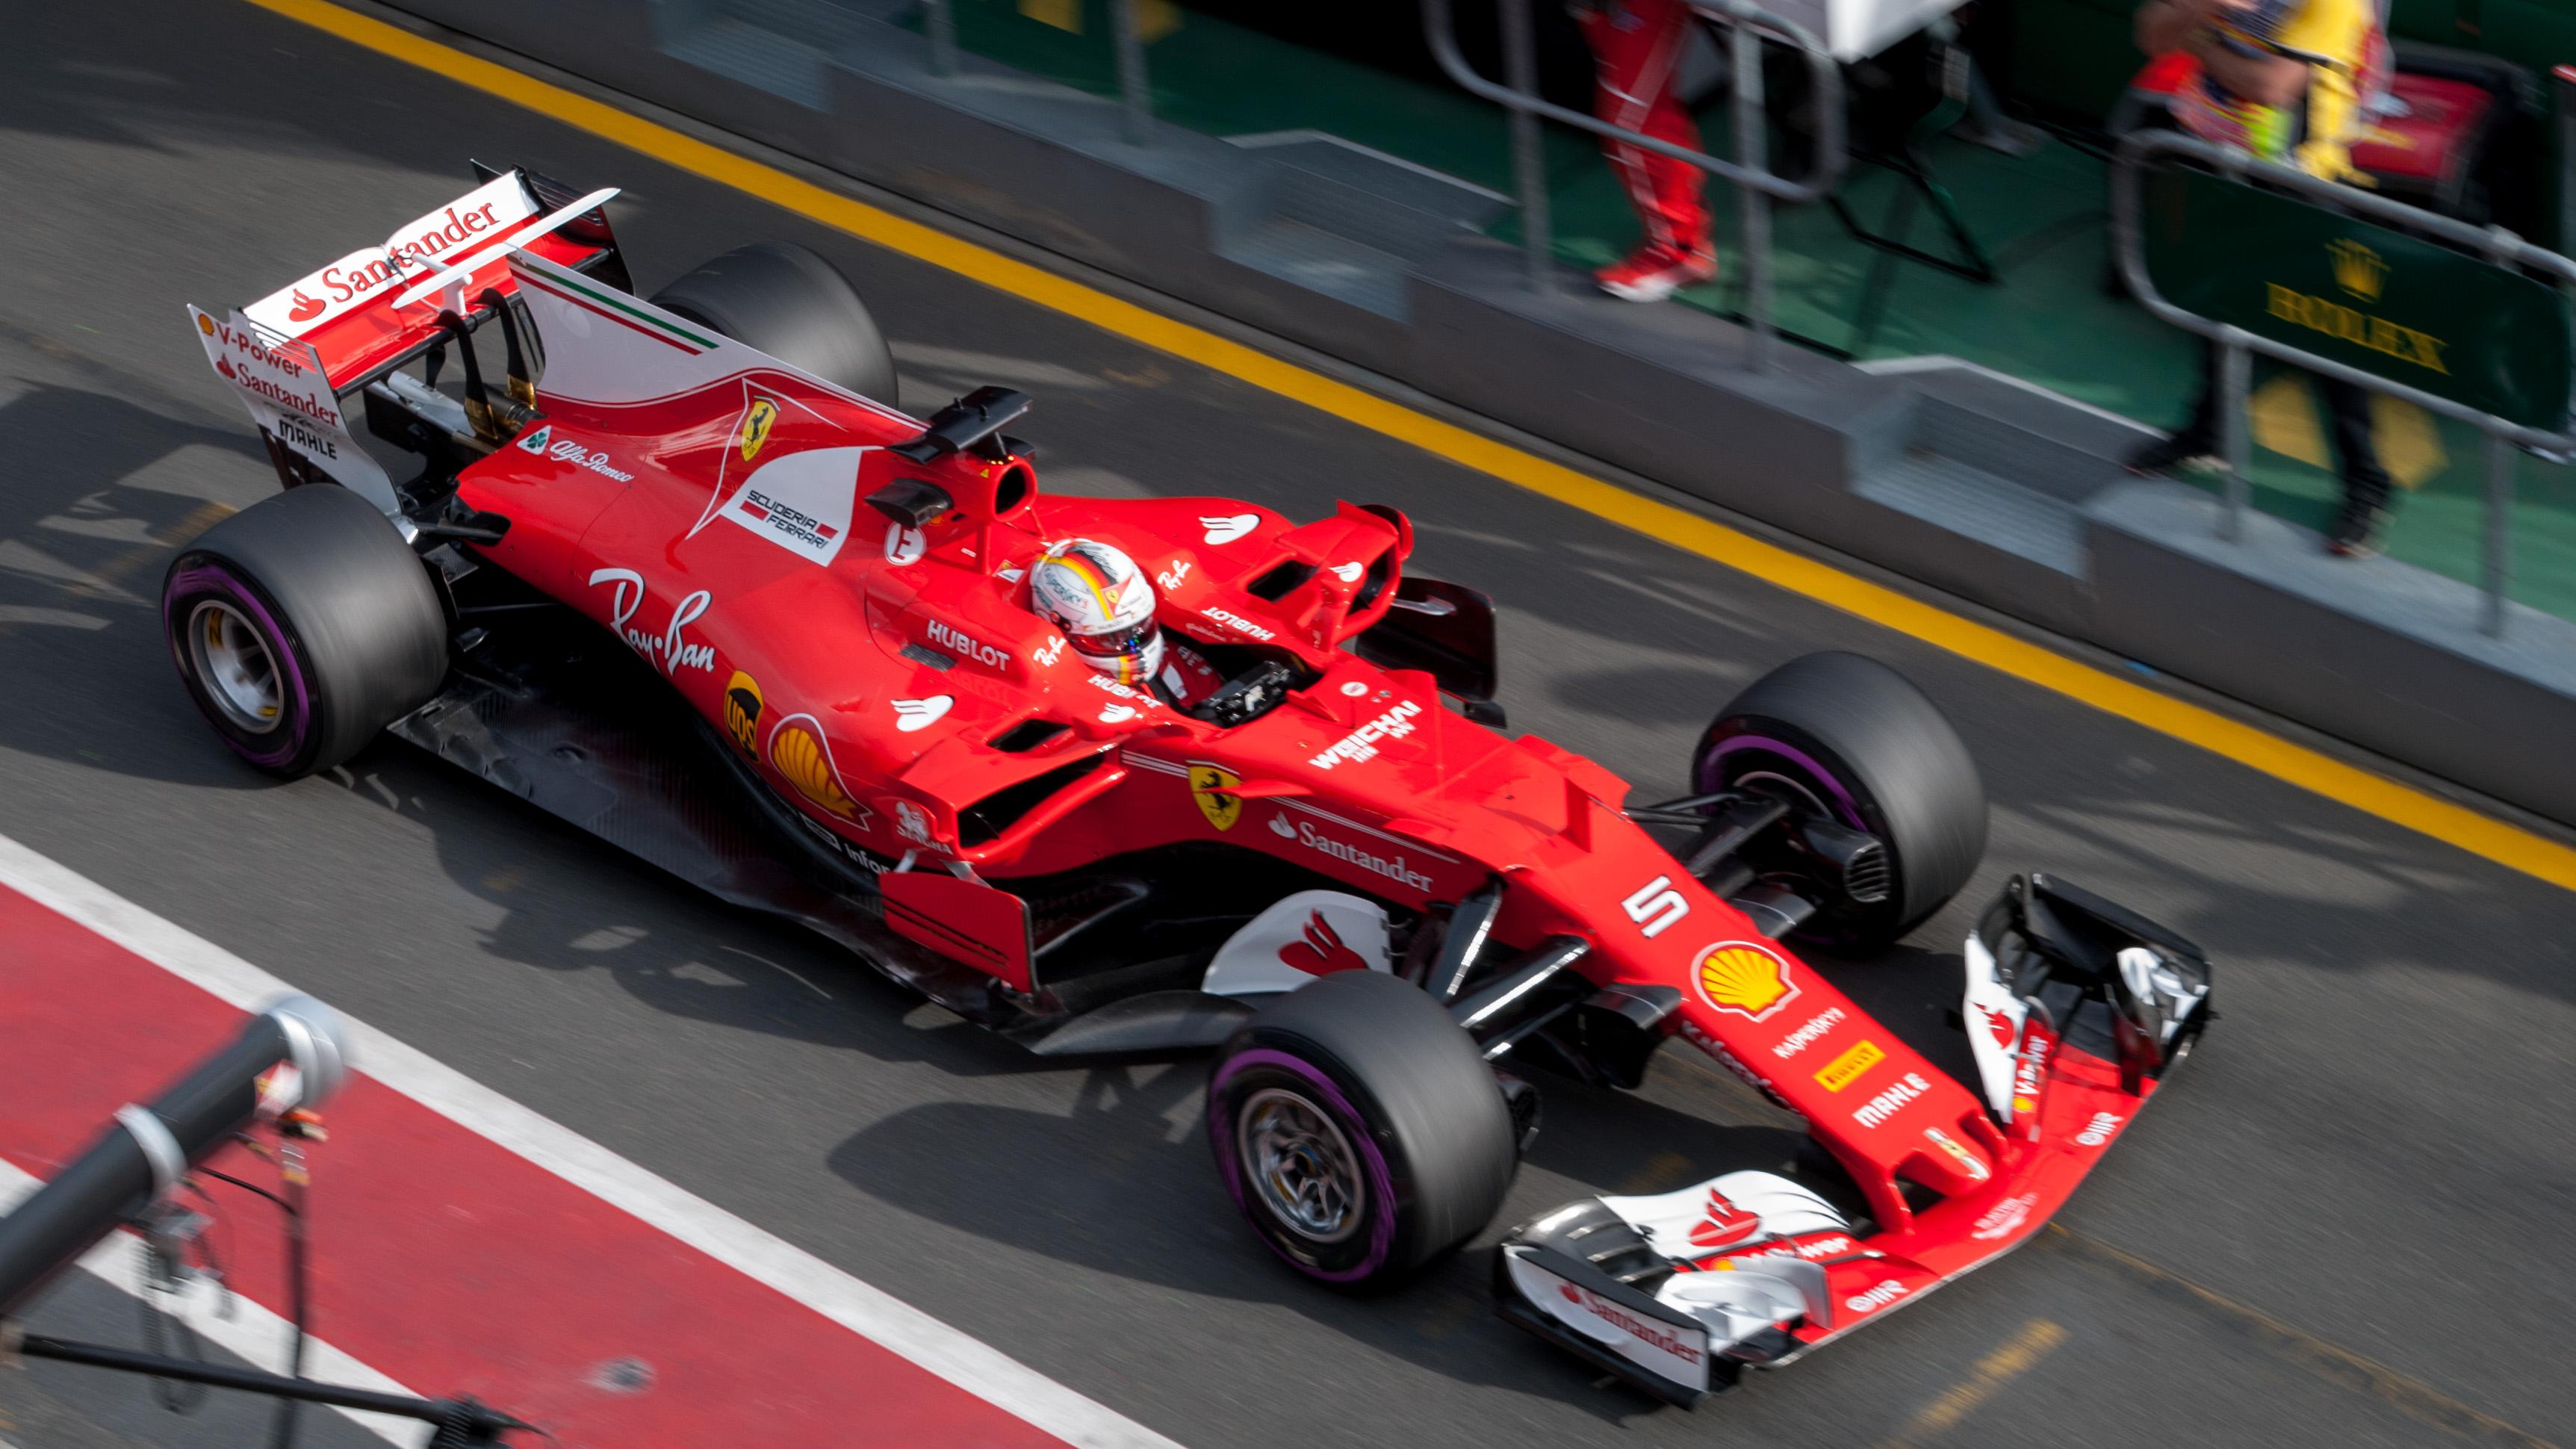 c1e9432ae90b28 2017 Australian Grand Prix - Wikipedia